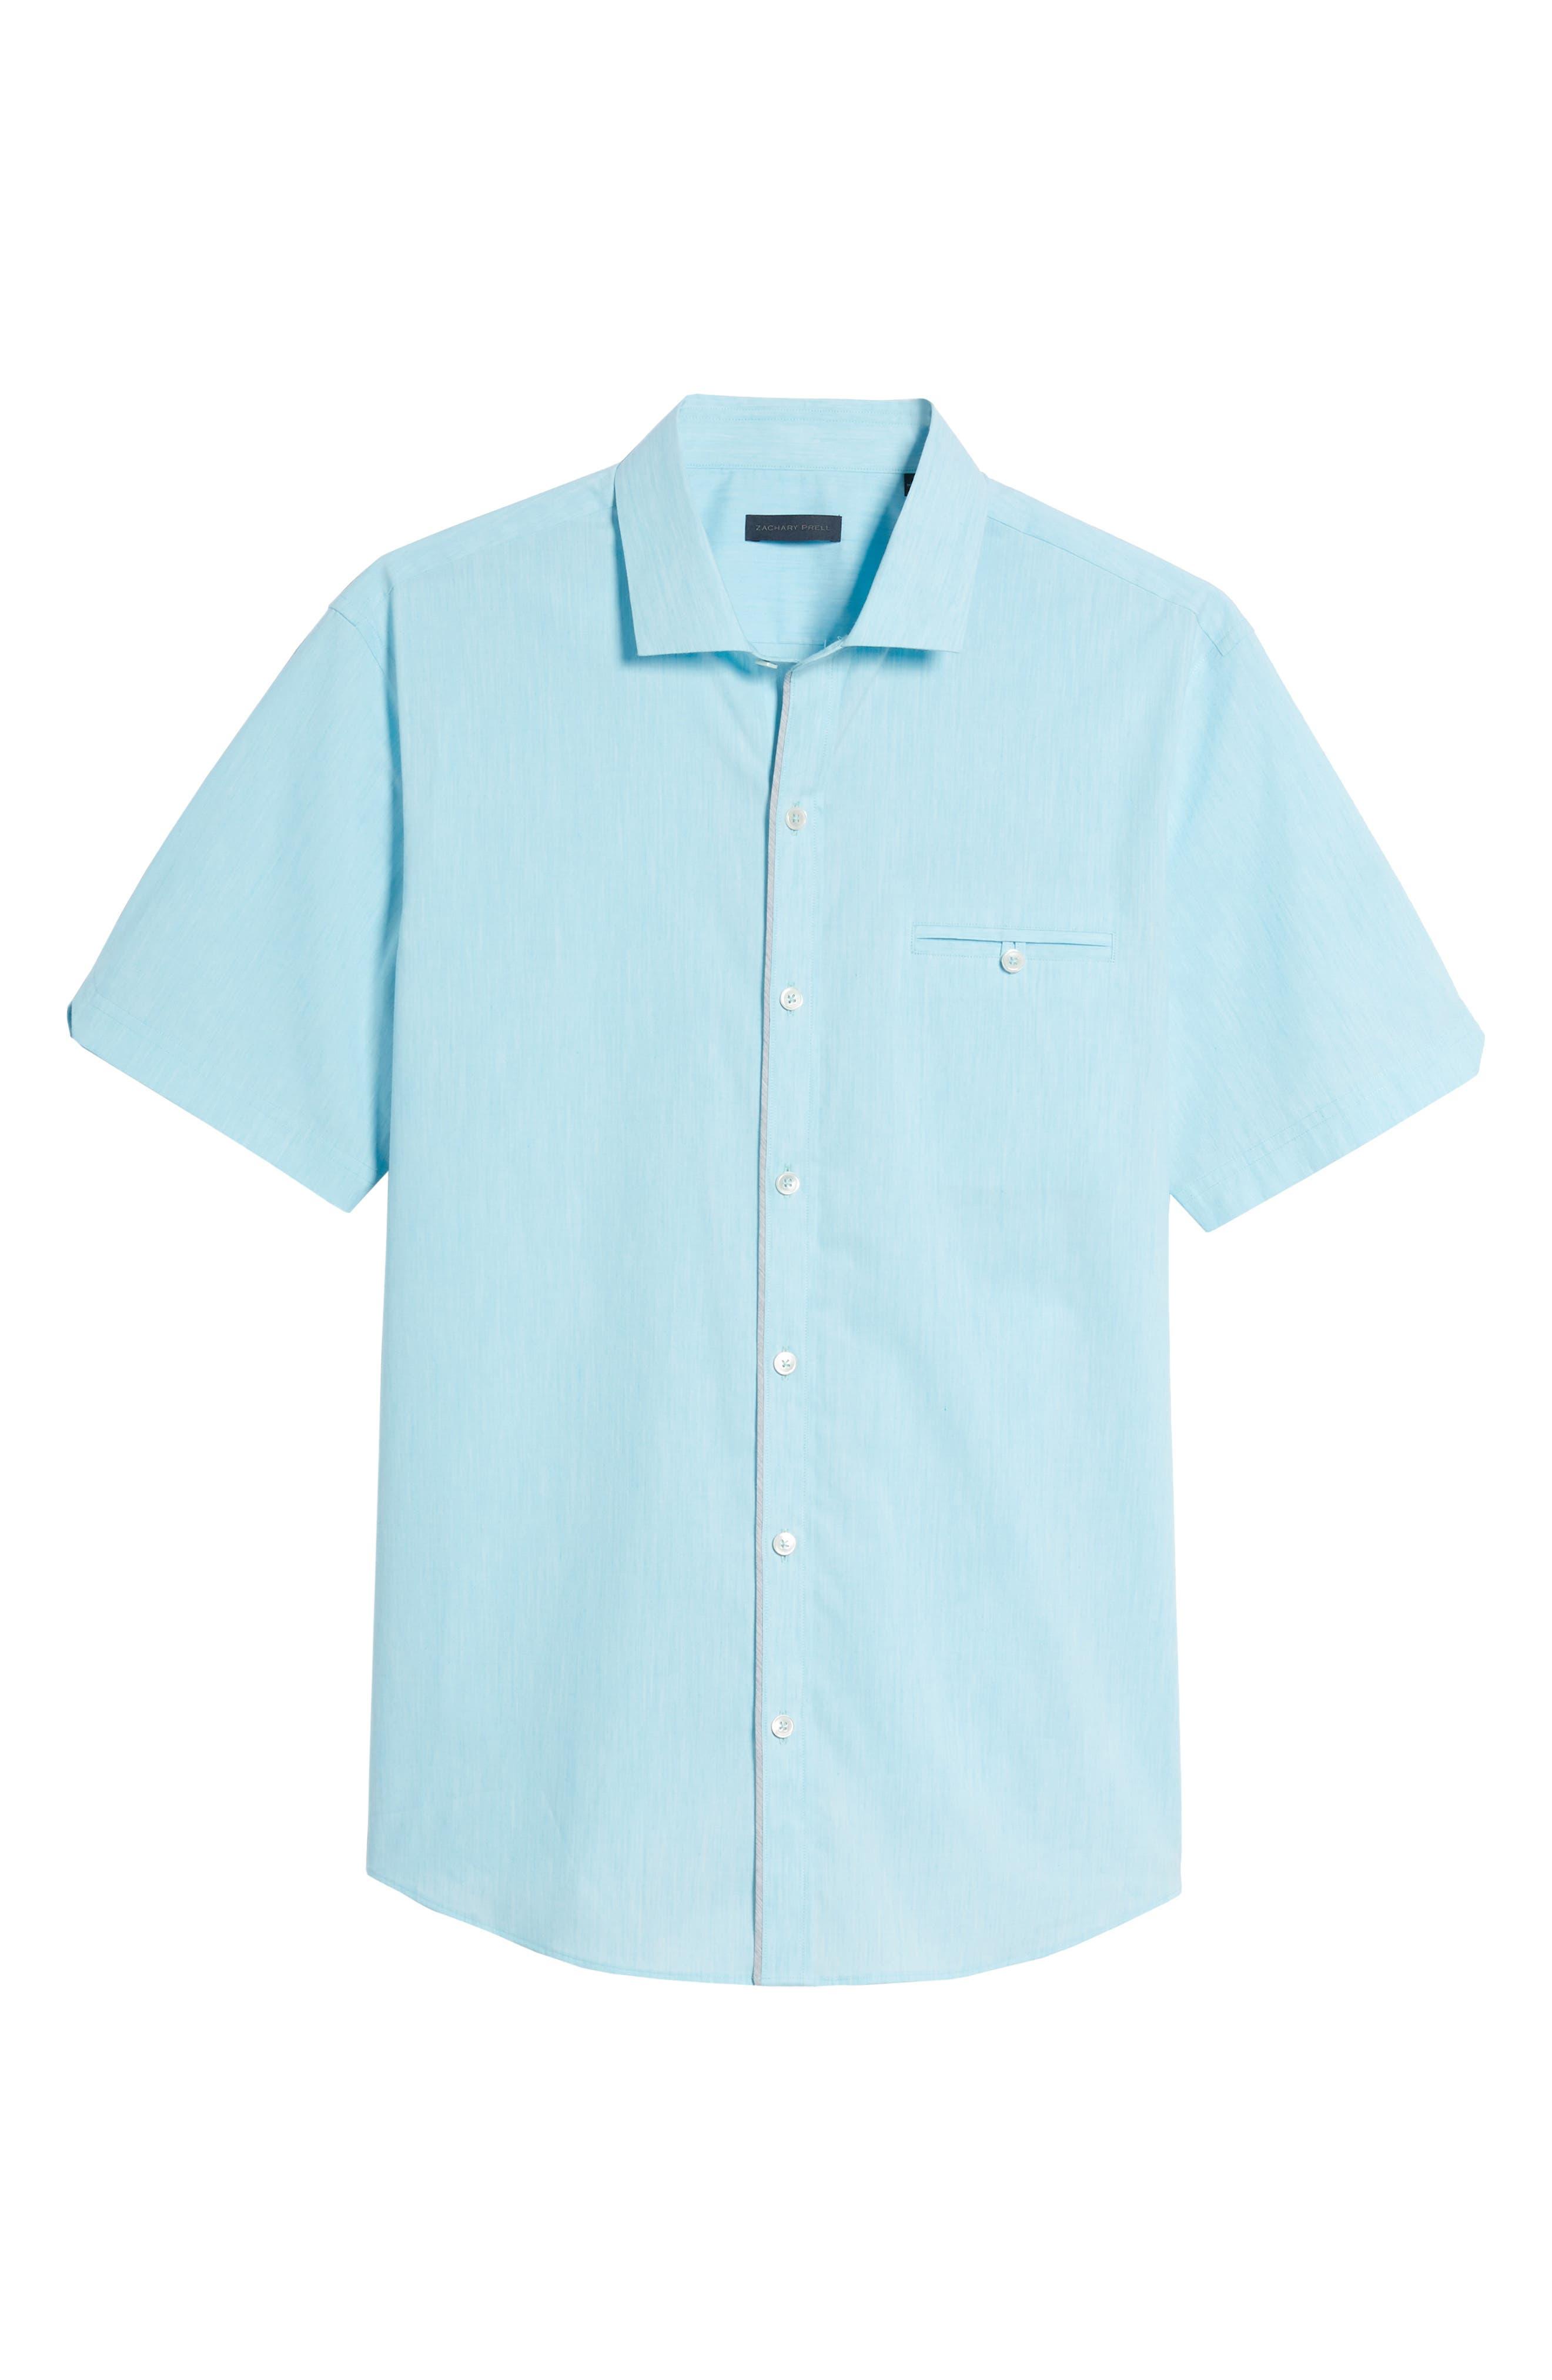 Baumann Slim Fit Sport Shirt,                             Alternate thumbnail 6, color,                             Aqua